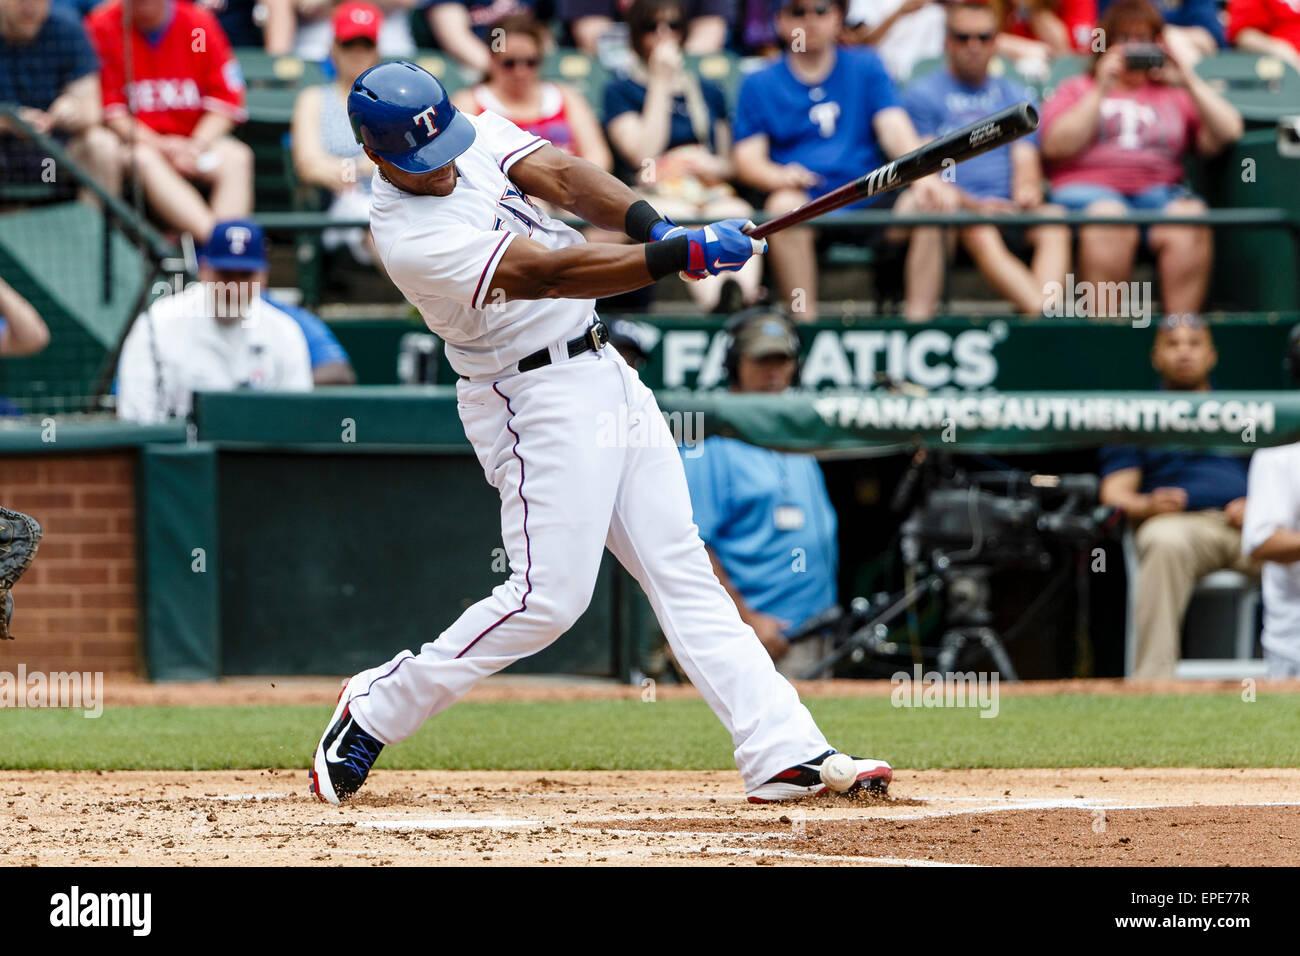 Arlington, Texas, USA. 17th May, 2015. Texas Rangers third baseman Adrian Beltre (29) fouls a ball off of his left - Stock Image